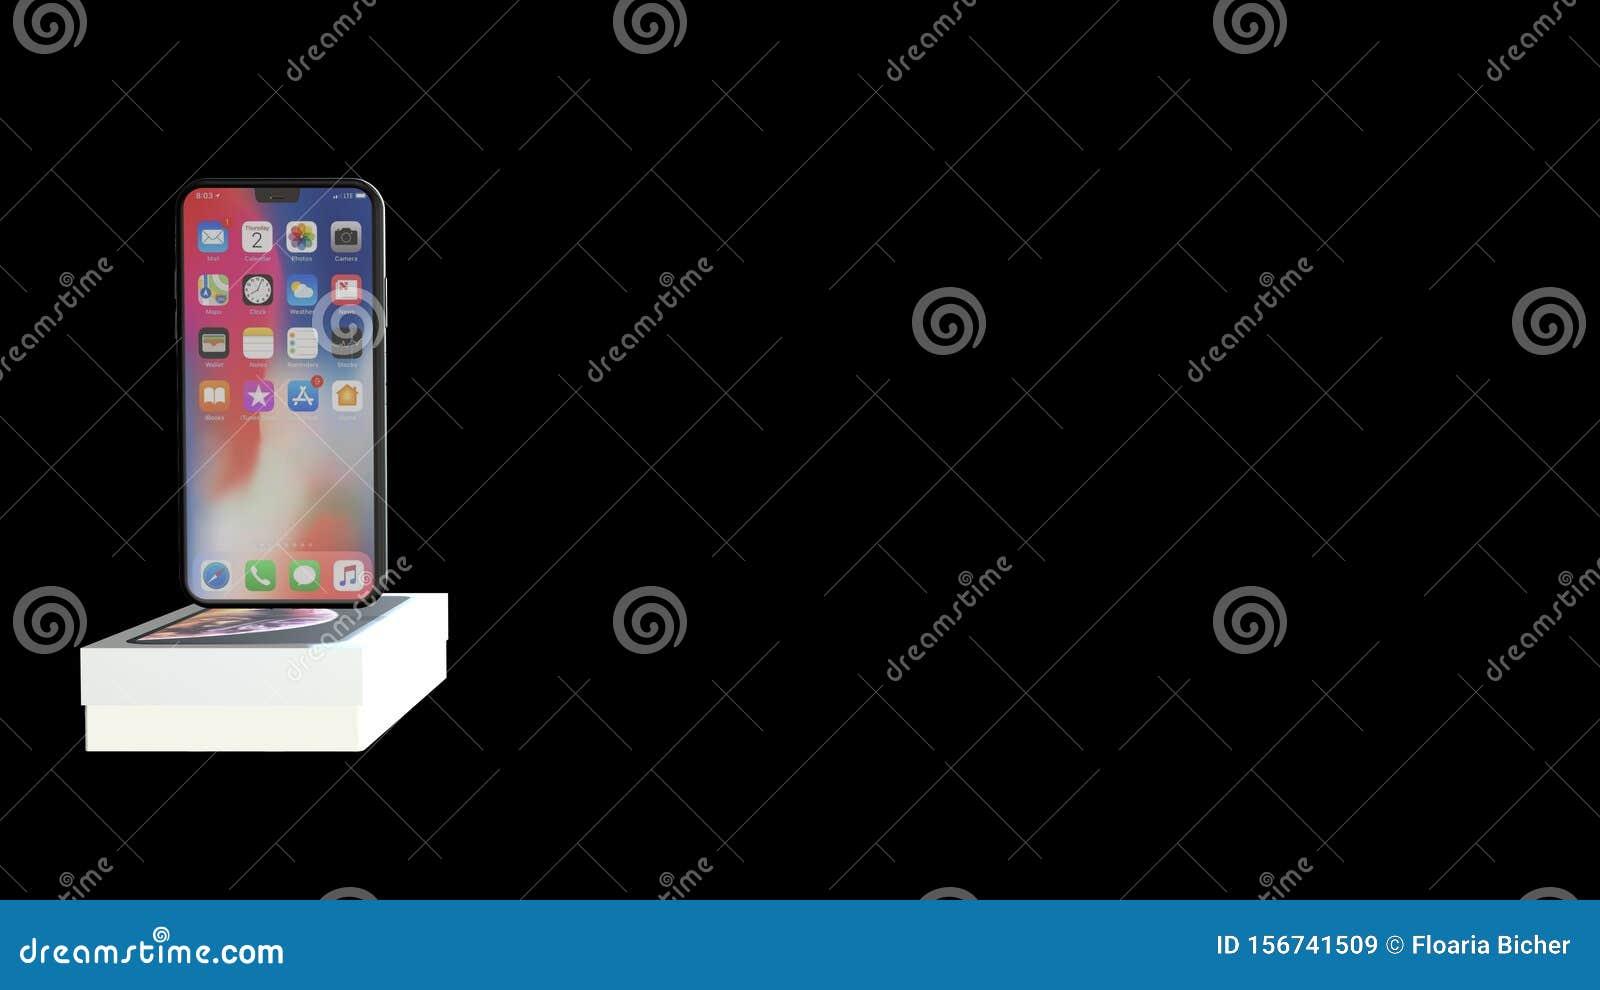 Chernivtsi, Ukraine - July 11, 2019: iPhone 11 new in original box isolated on black background.